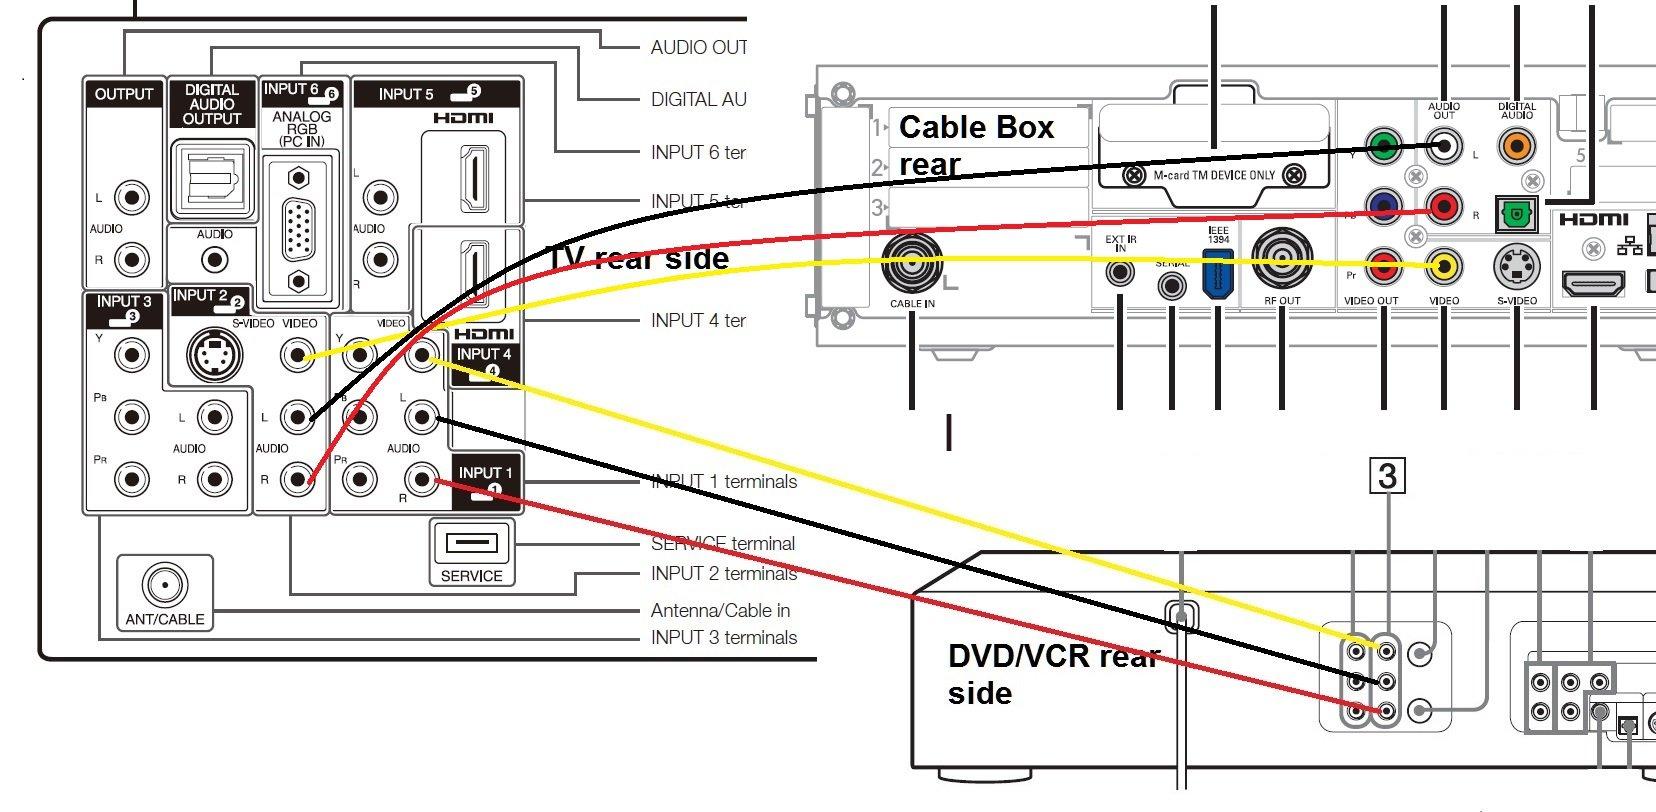 ww2justansweruploadsSHShahidSony2014010 – Lowe 2004 Trinidad 220 Wiring Diagram